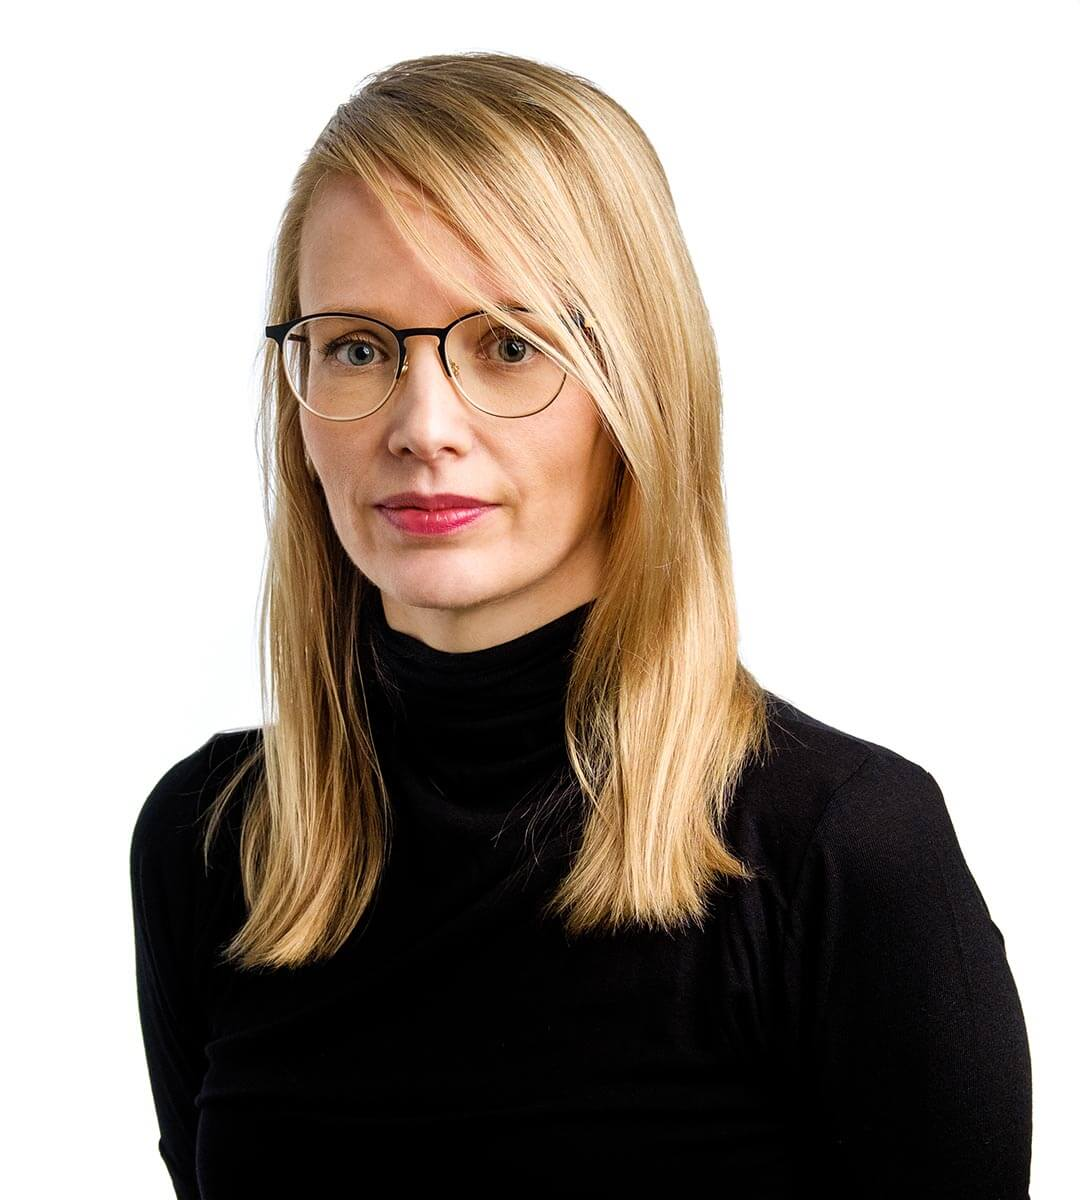 Joanna Sokołowska